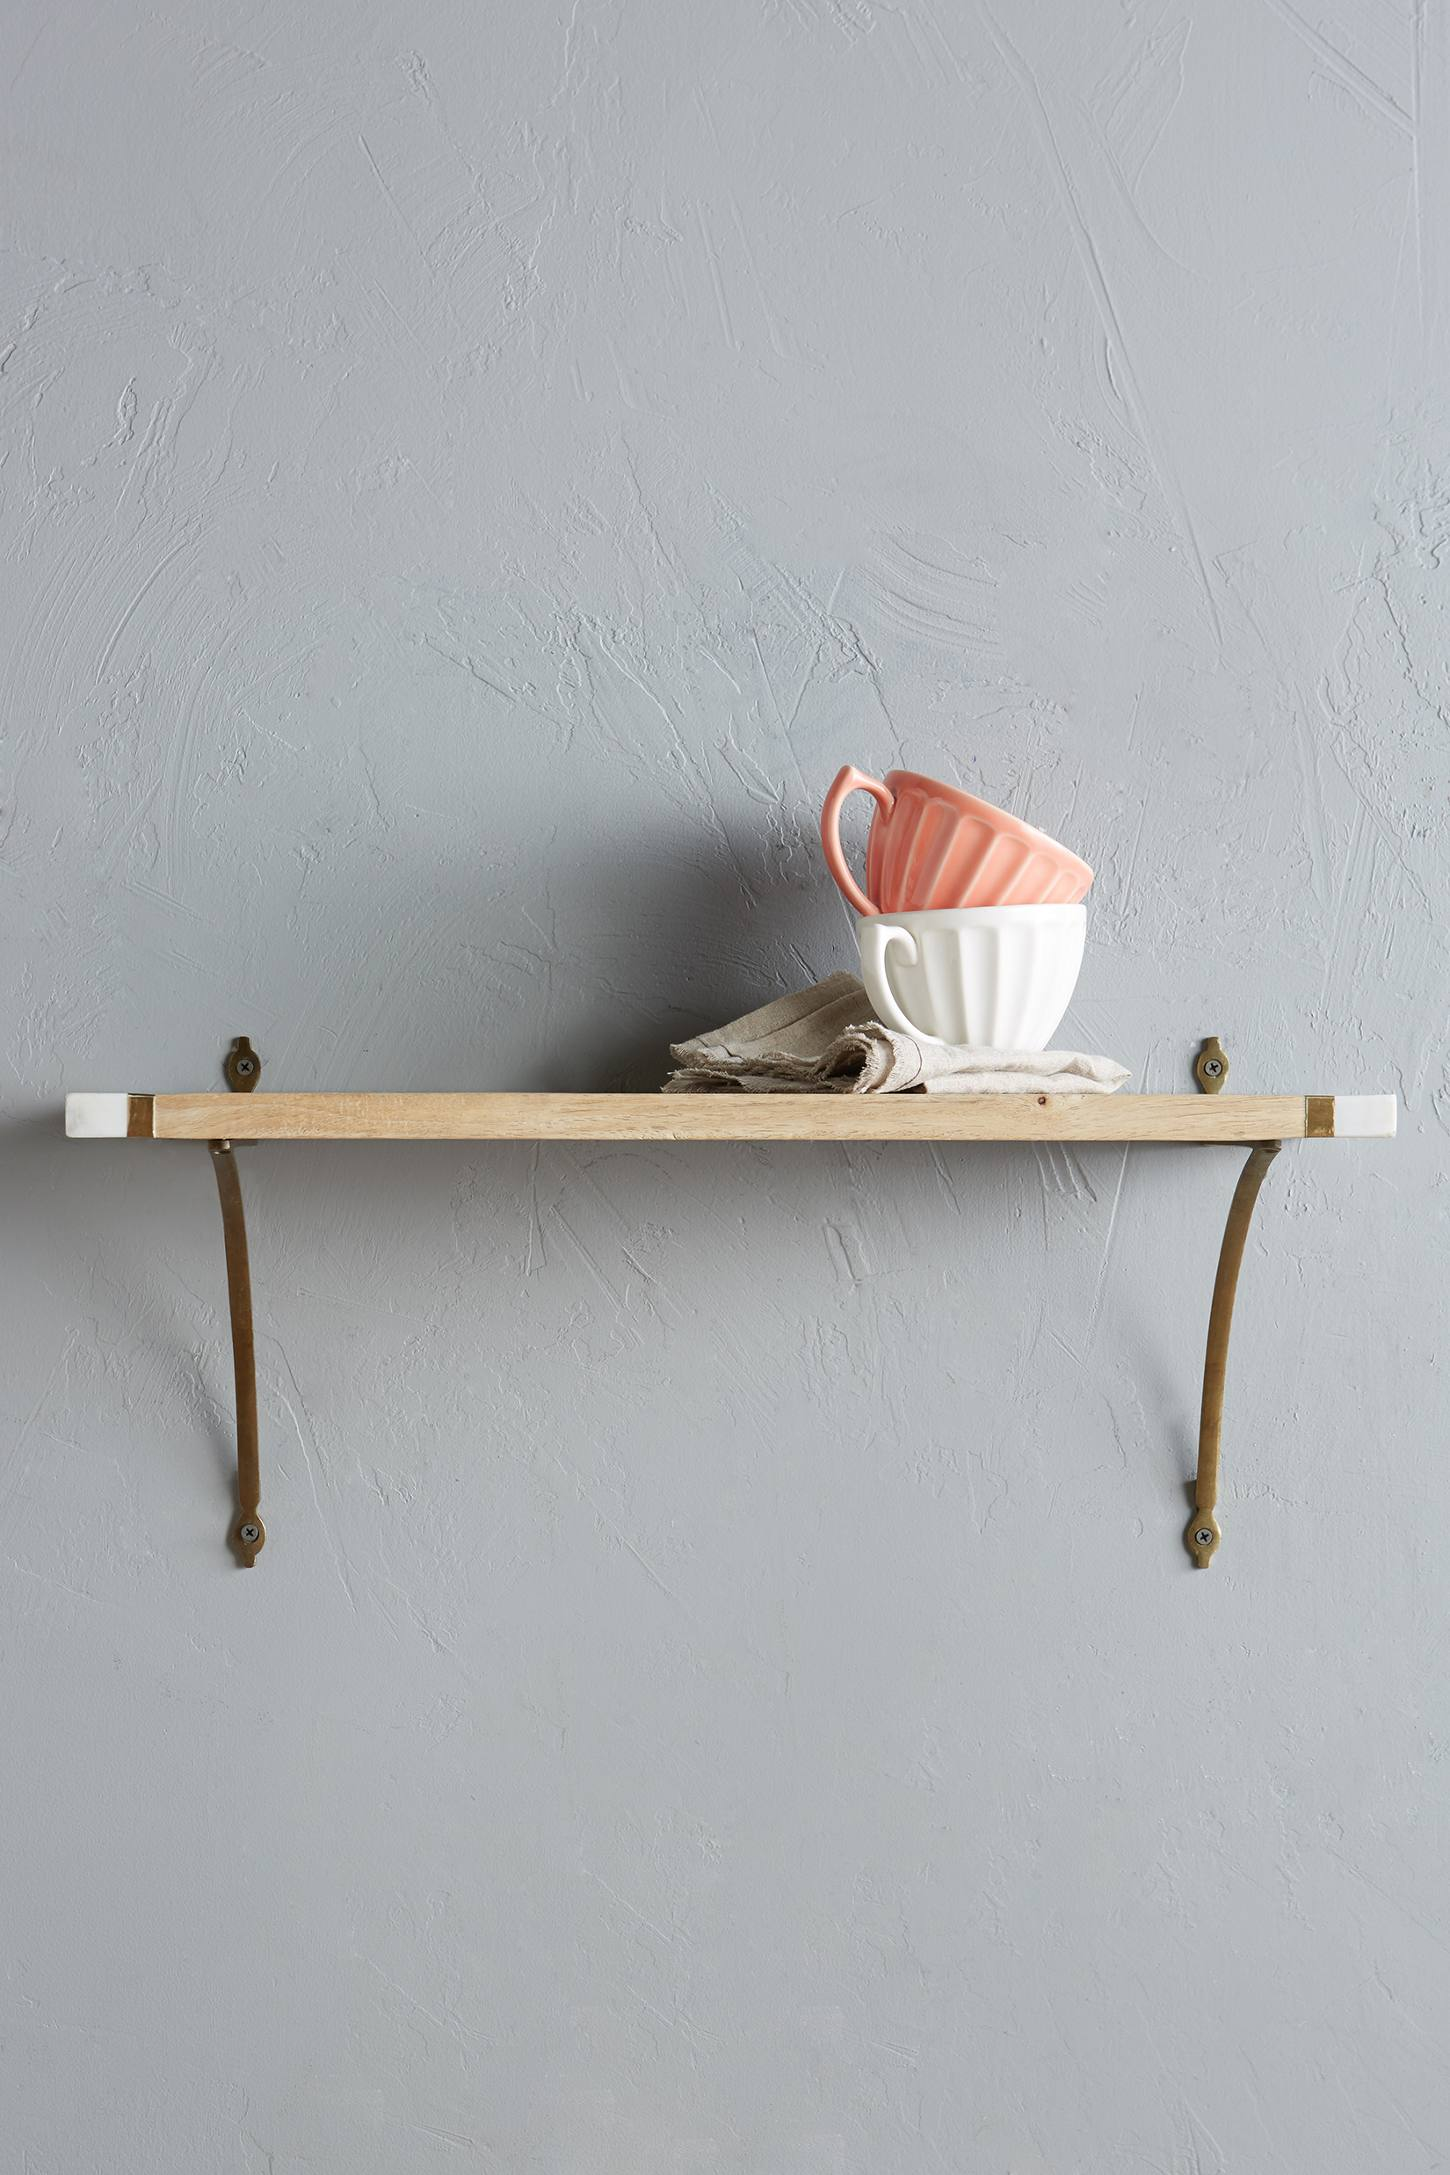 Marble-Edged Shelf